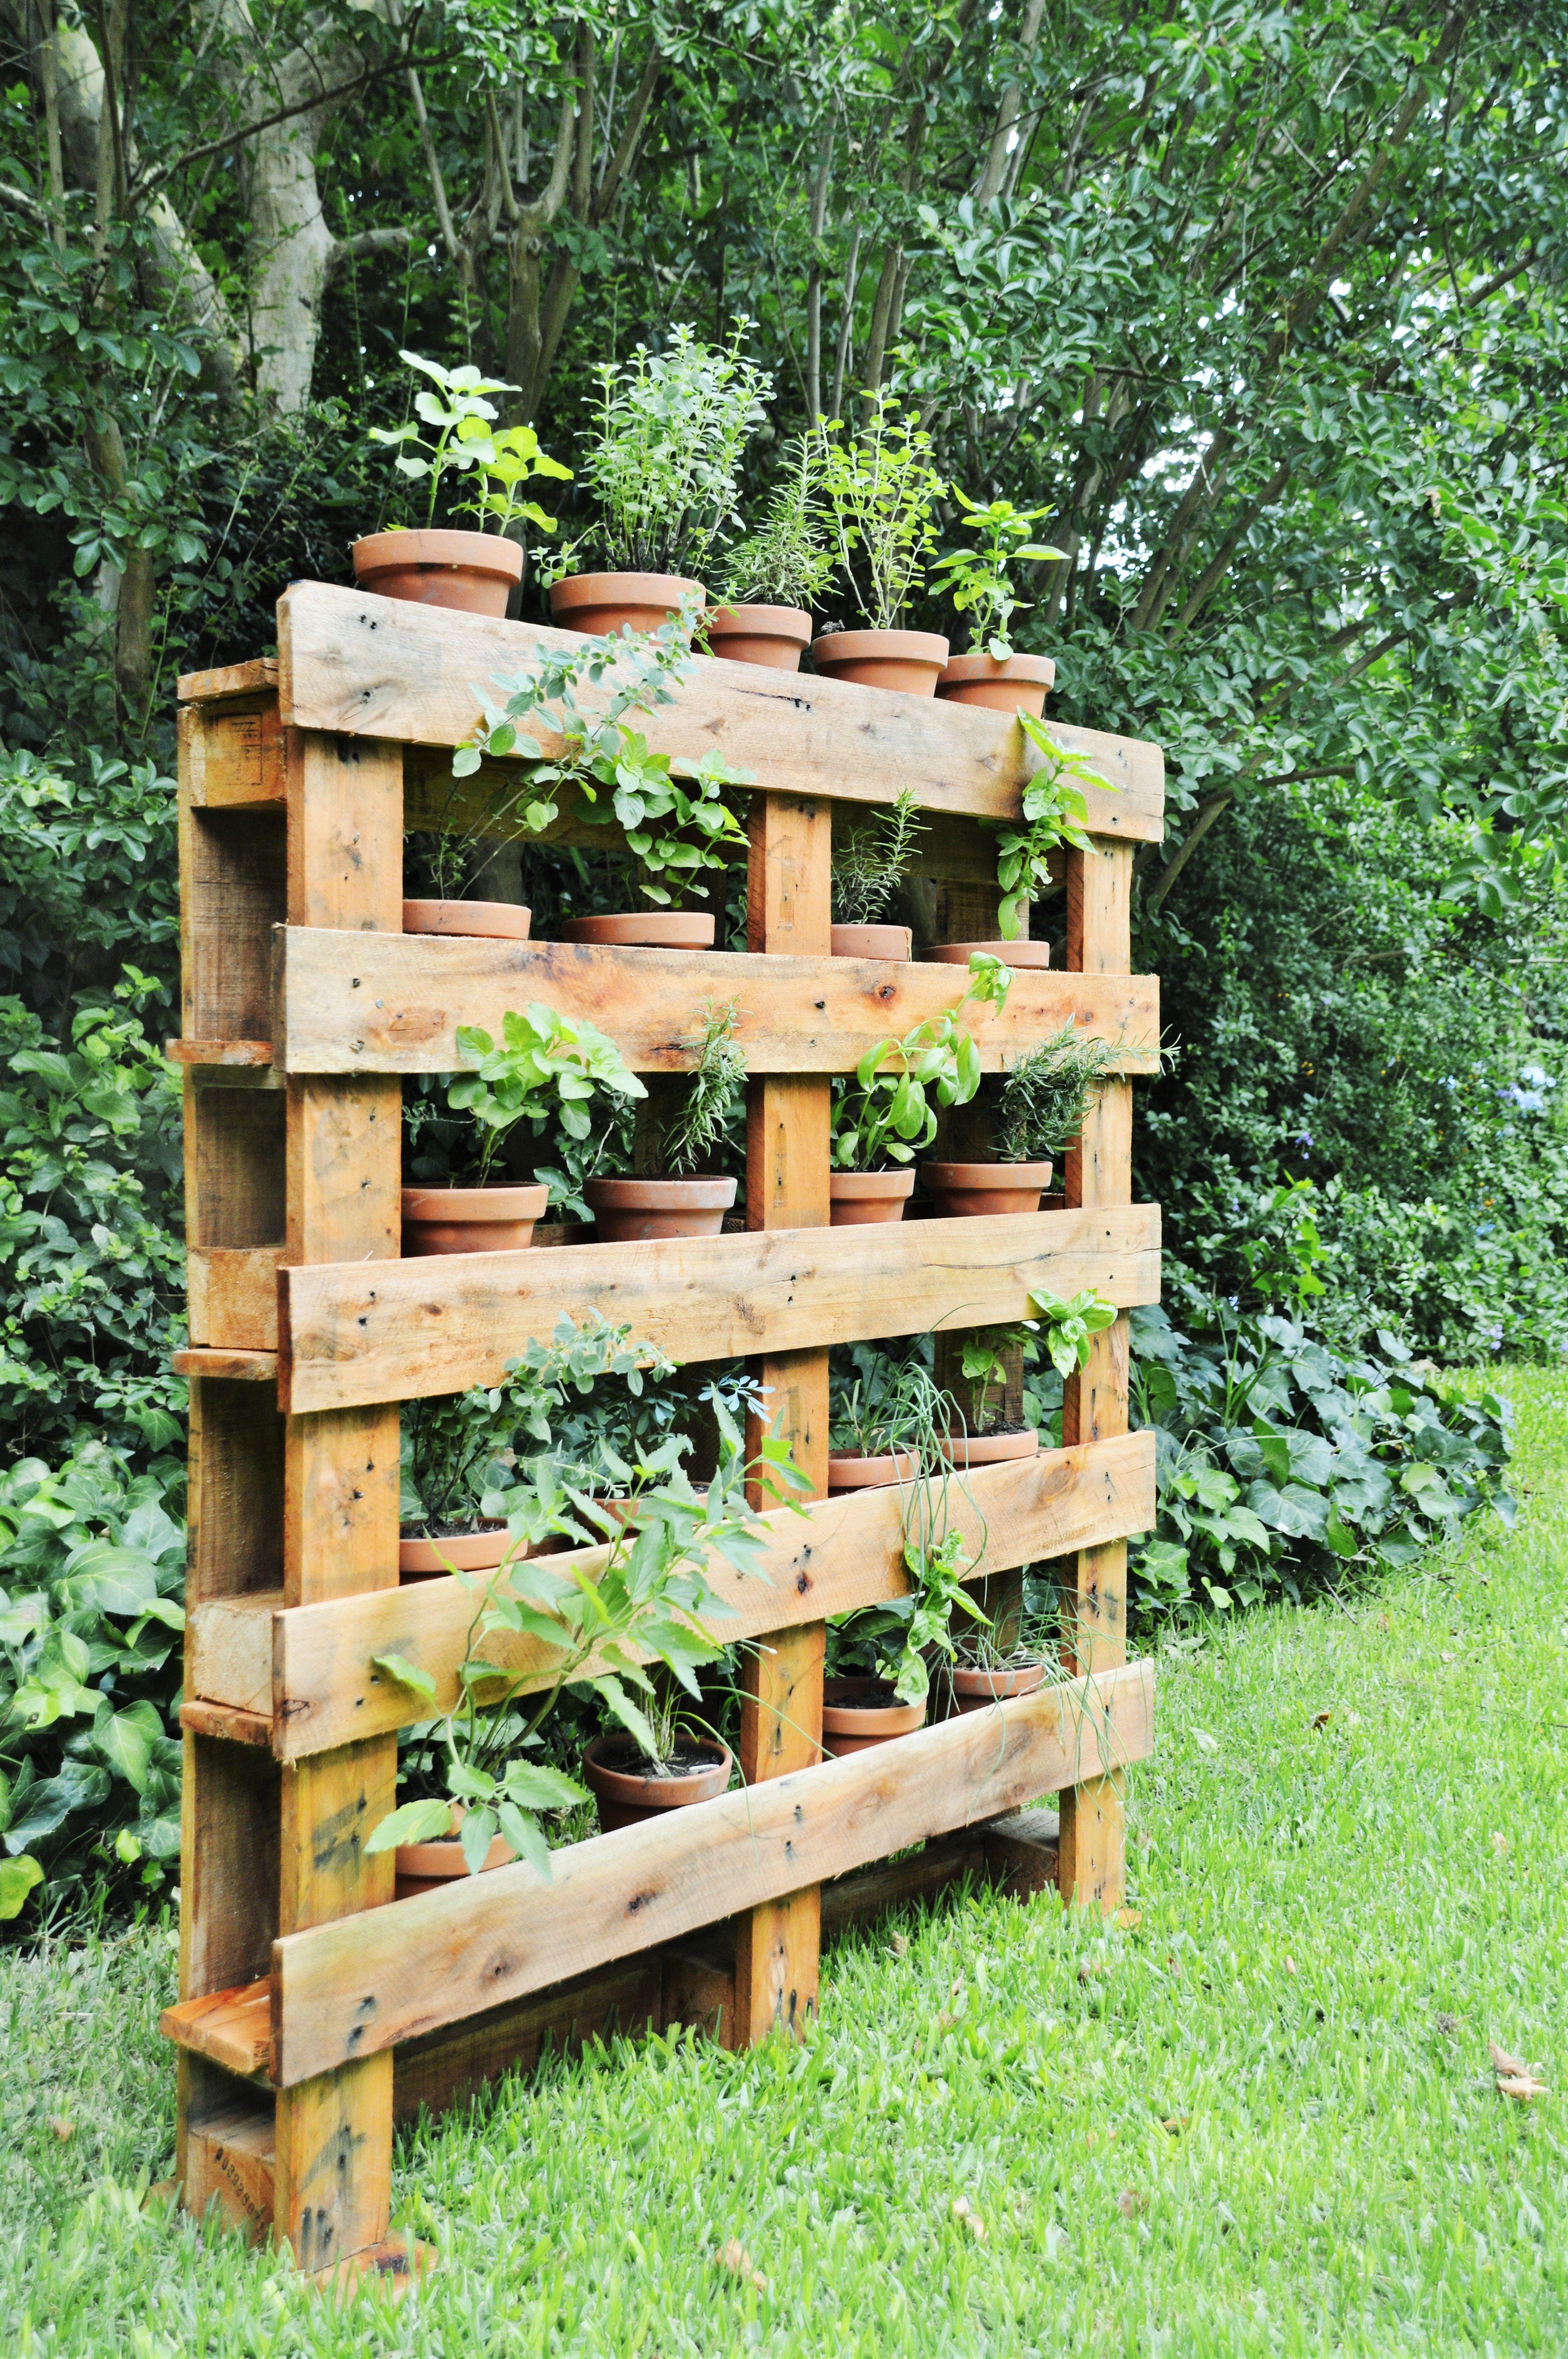 Huerta vertical de especias hecha a partir de pallets - Huerto vertical casero ...